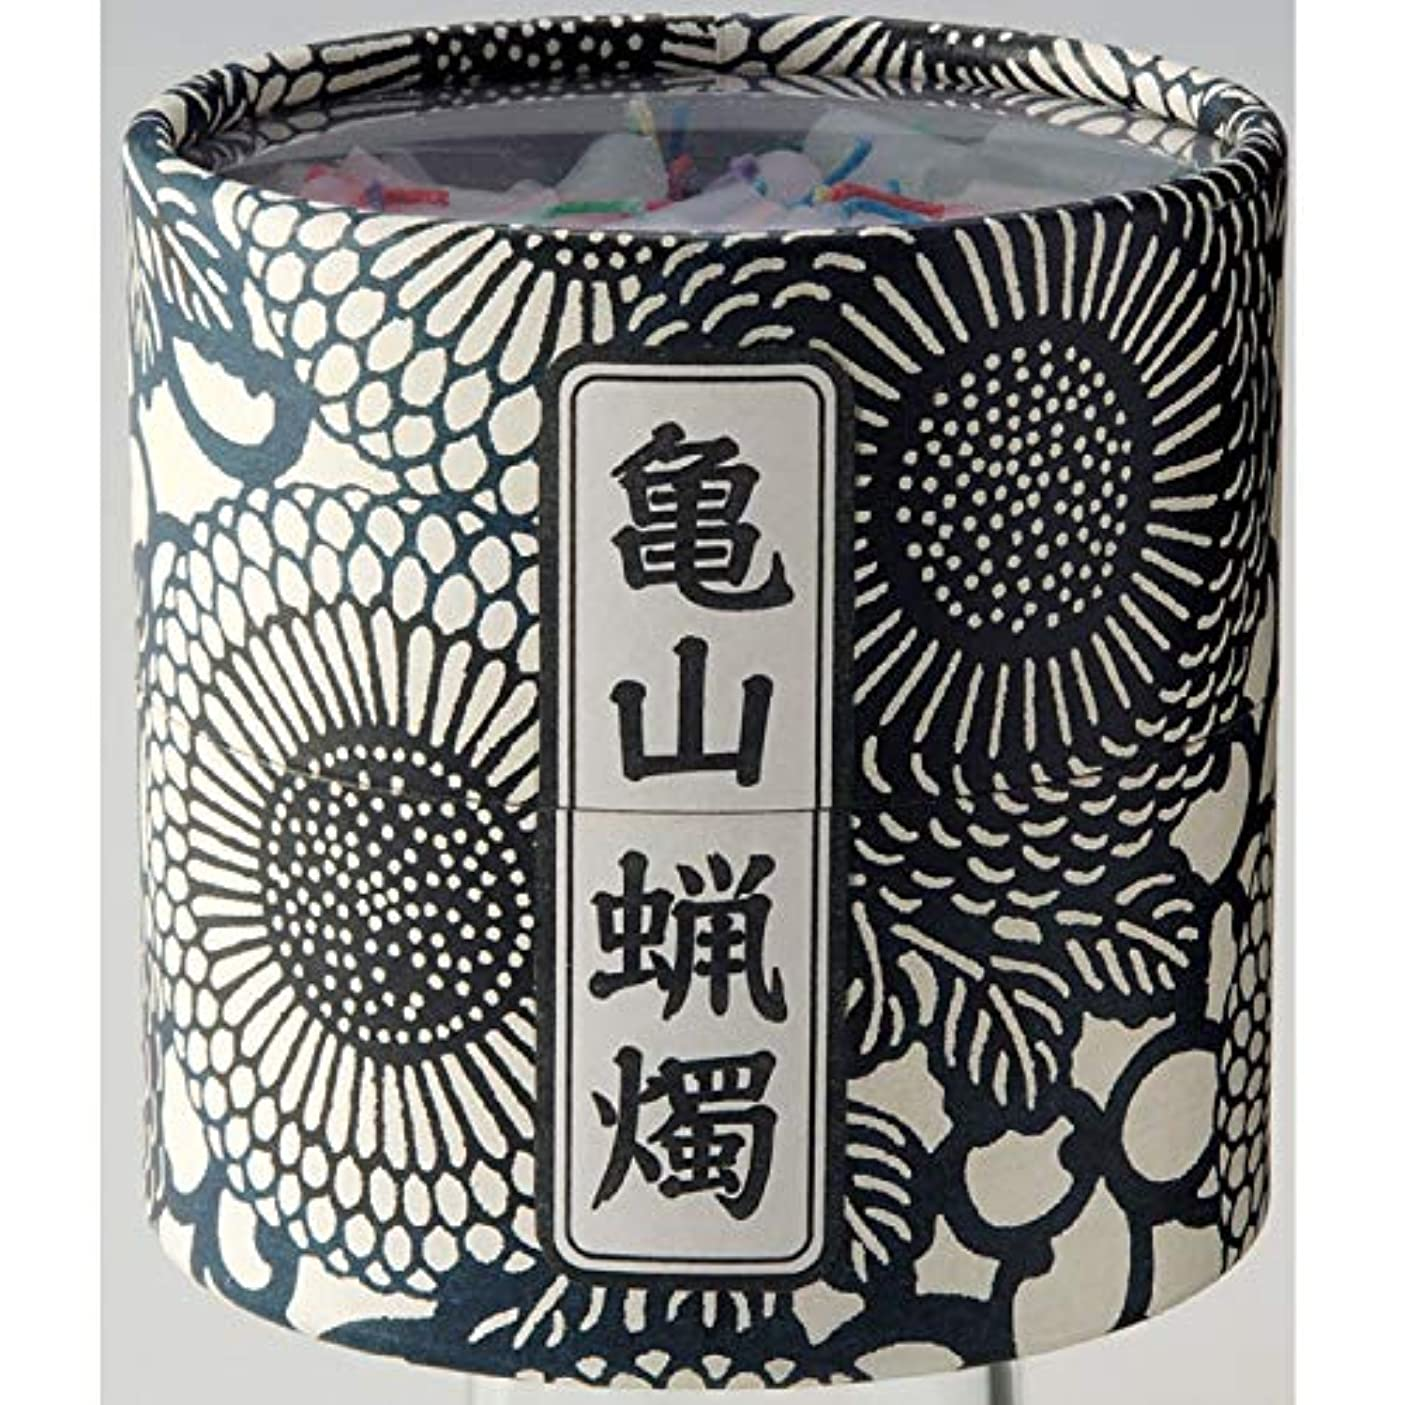 赤外線割合翻訳者亀山五色蝋燭(ローソク)約300本入り